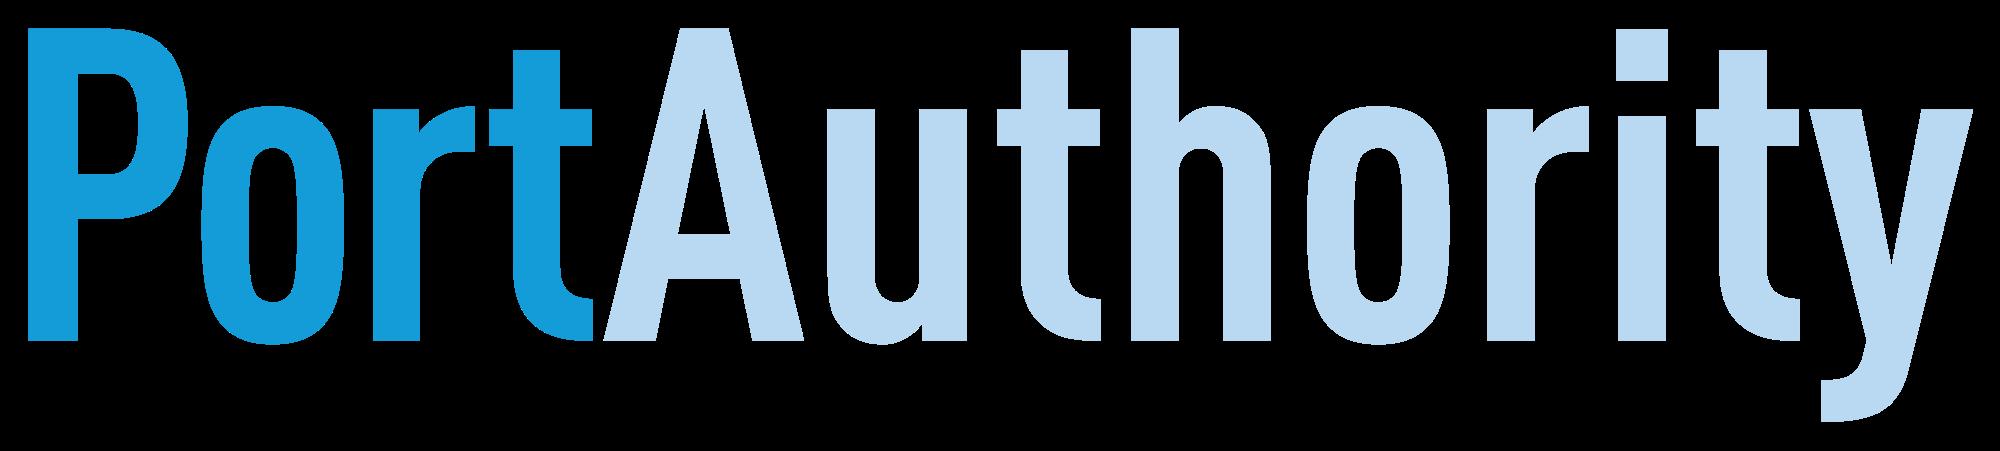 Port Authority of Alleghany County